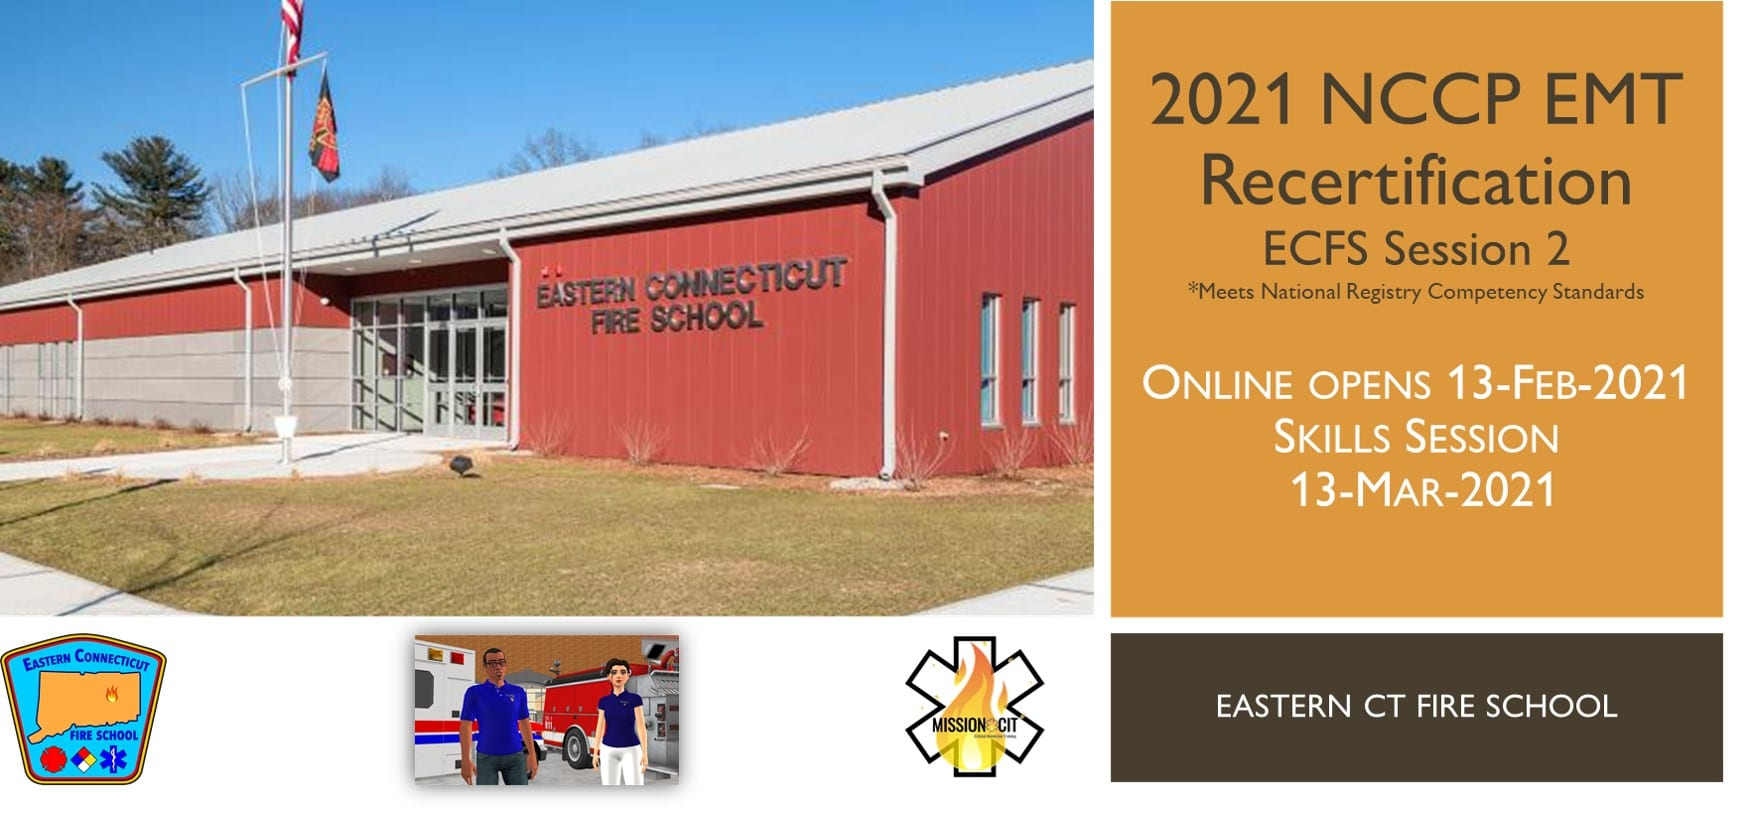 EMT NCCP Recertification Hybrid Course | ECFS | 2021 Session 2